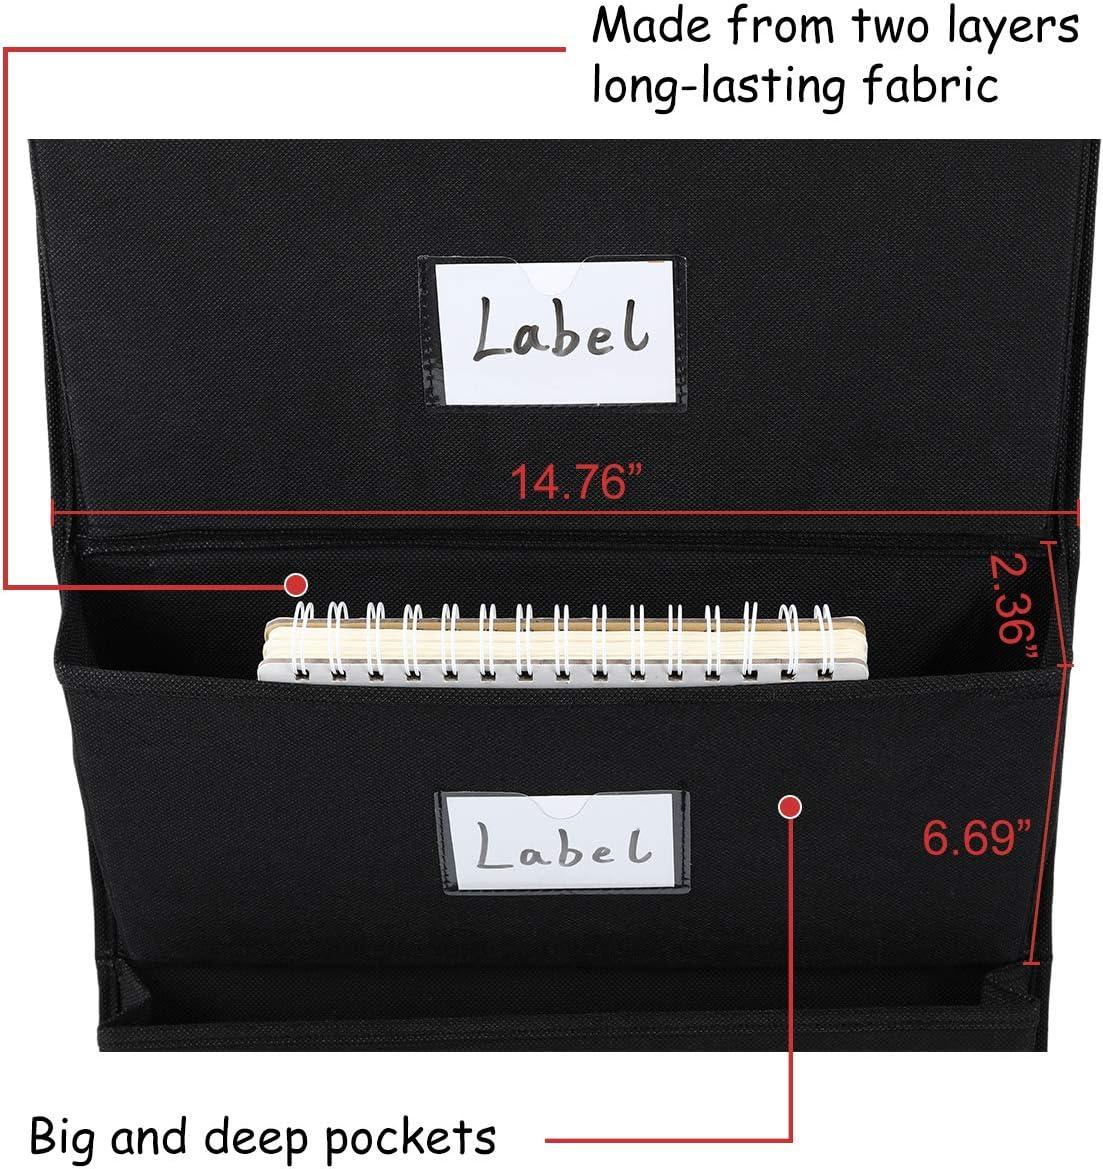 EasyPAG Wall Mount Over Door Organizer Office Supplies 4 Pockets Hanging File Holder Black